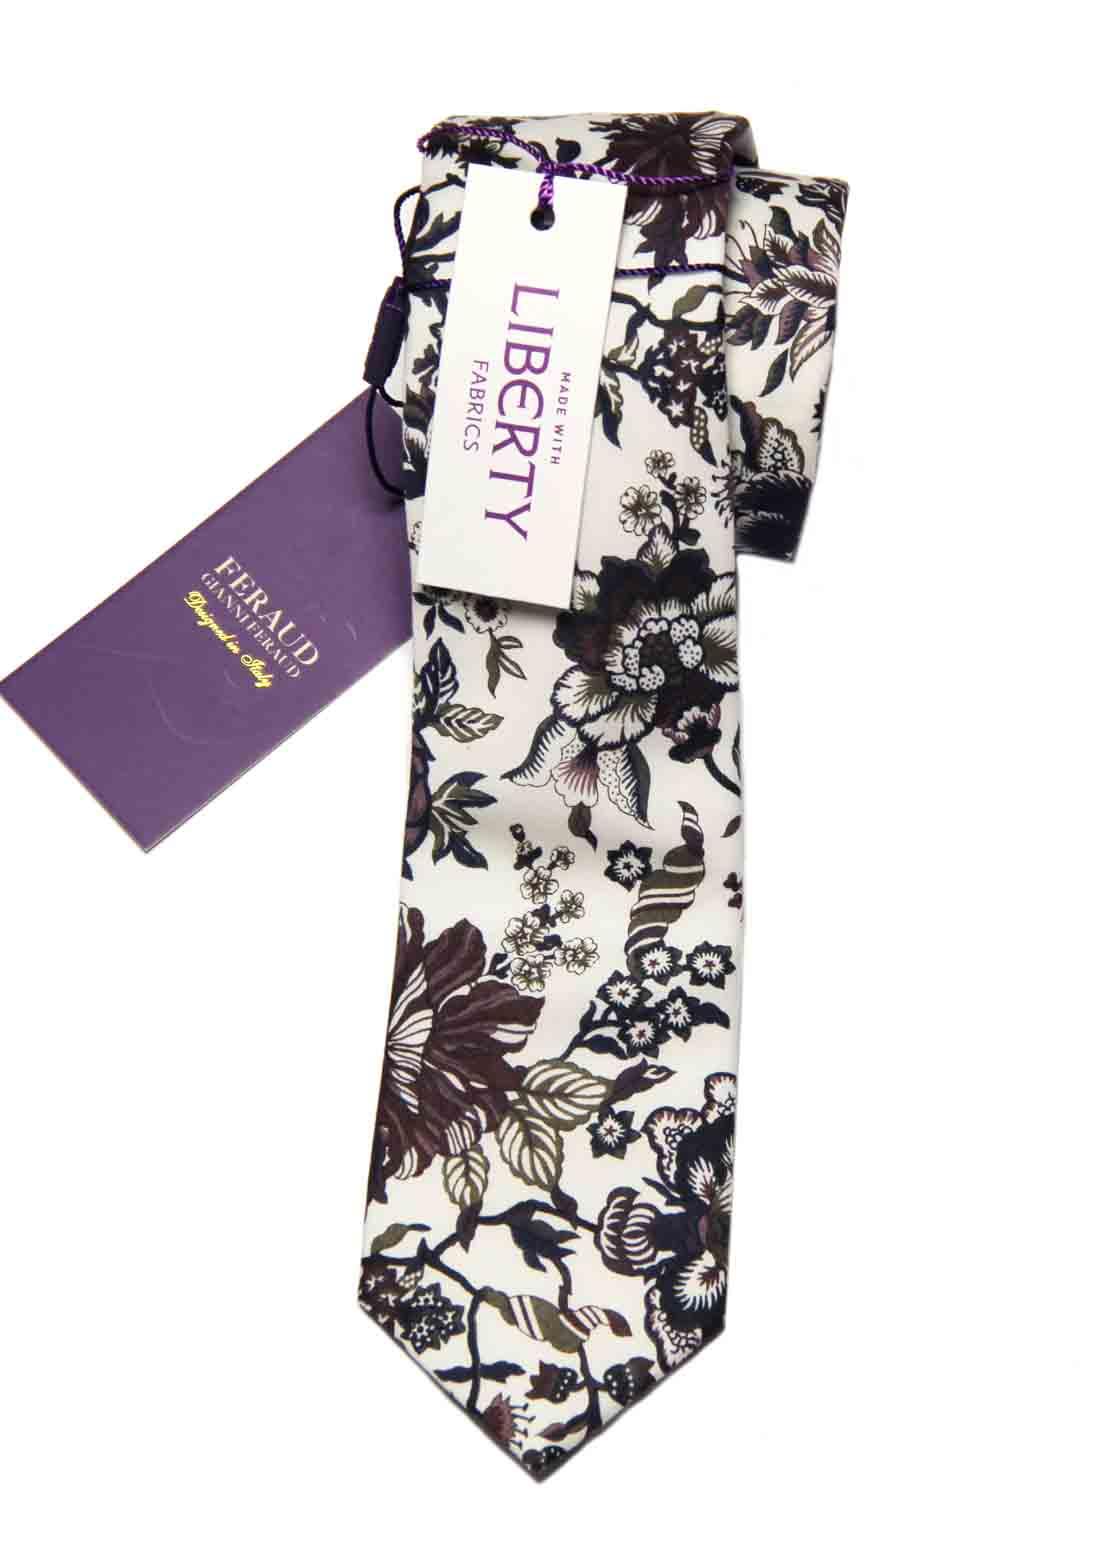 Feraud Liberty of London Fabric Tie Floral White Purple Maroon Cotton Men's